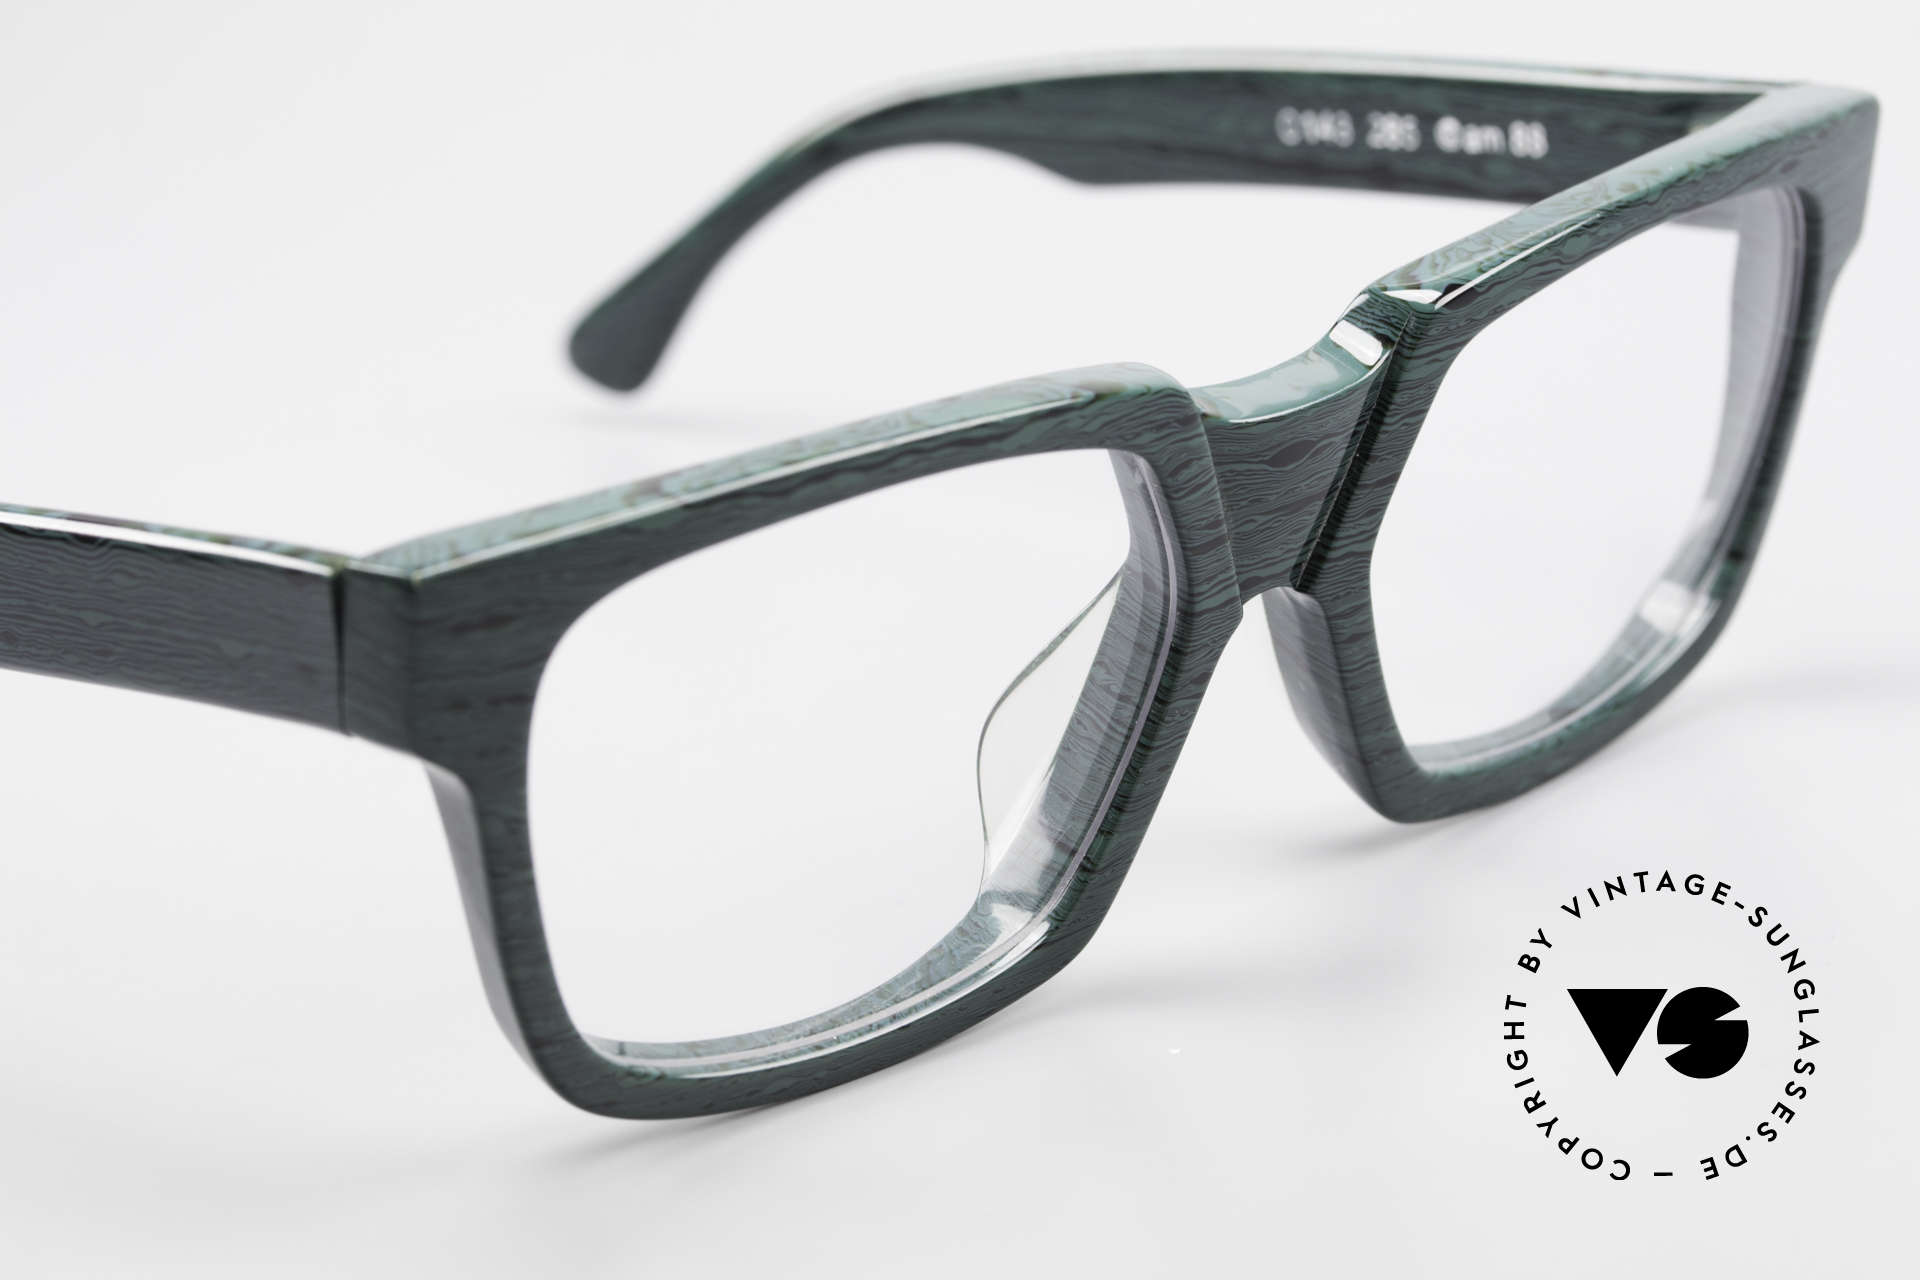 Alain Mikli 0143 / 285 Striking 1980's Eyeglasses, NO RETRO EYEWER, but a 30 years old ORIGINAL!, Made for Men and Women